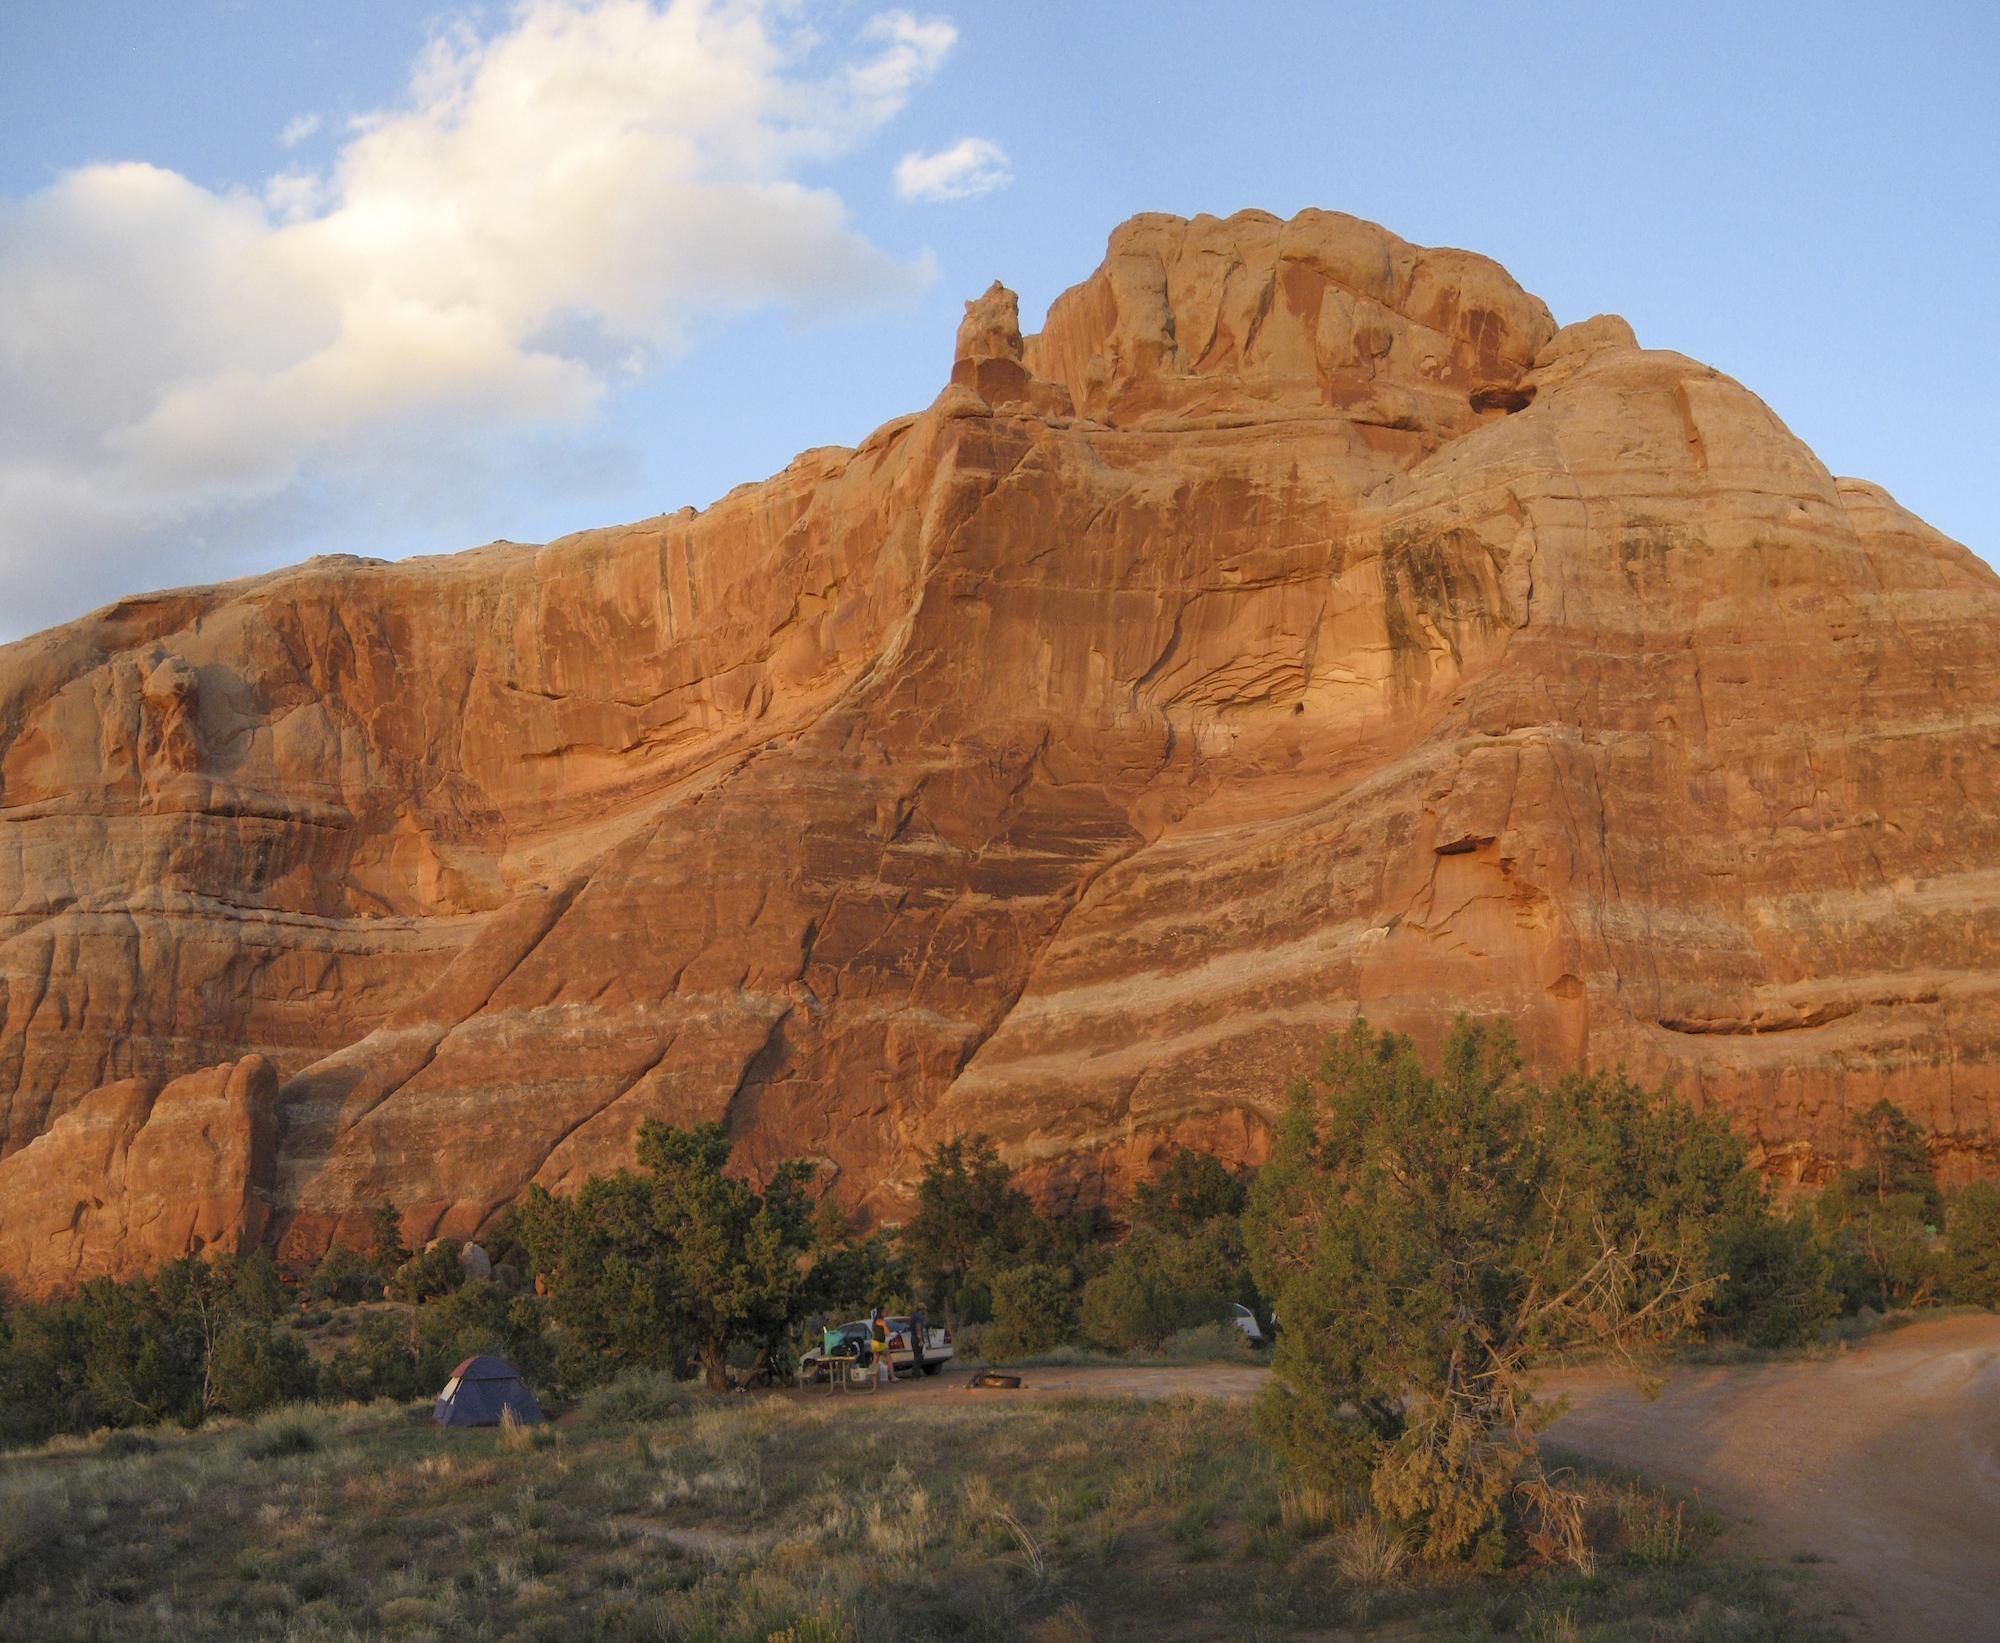 Cowskin Camp Navajo Sandstone Amphitheater